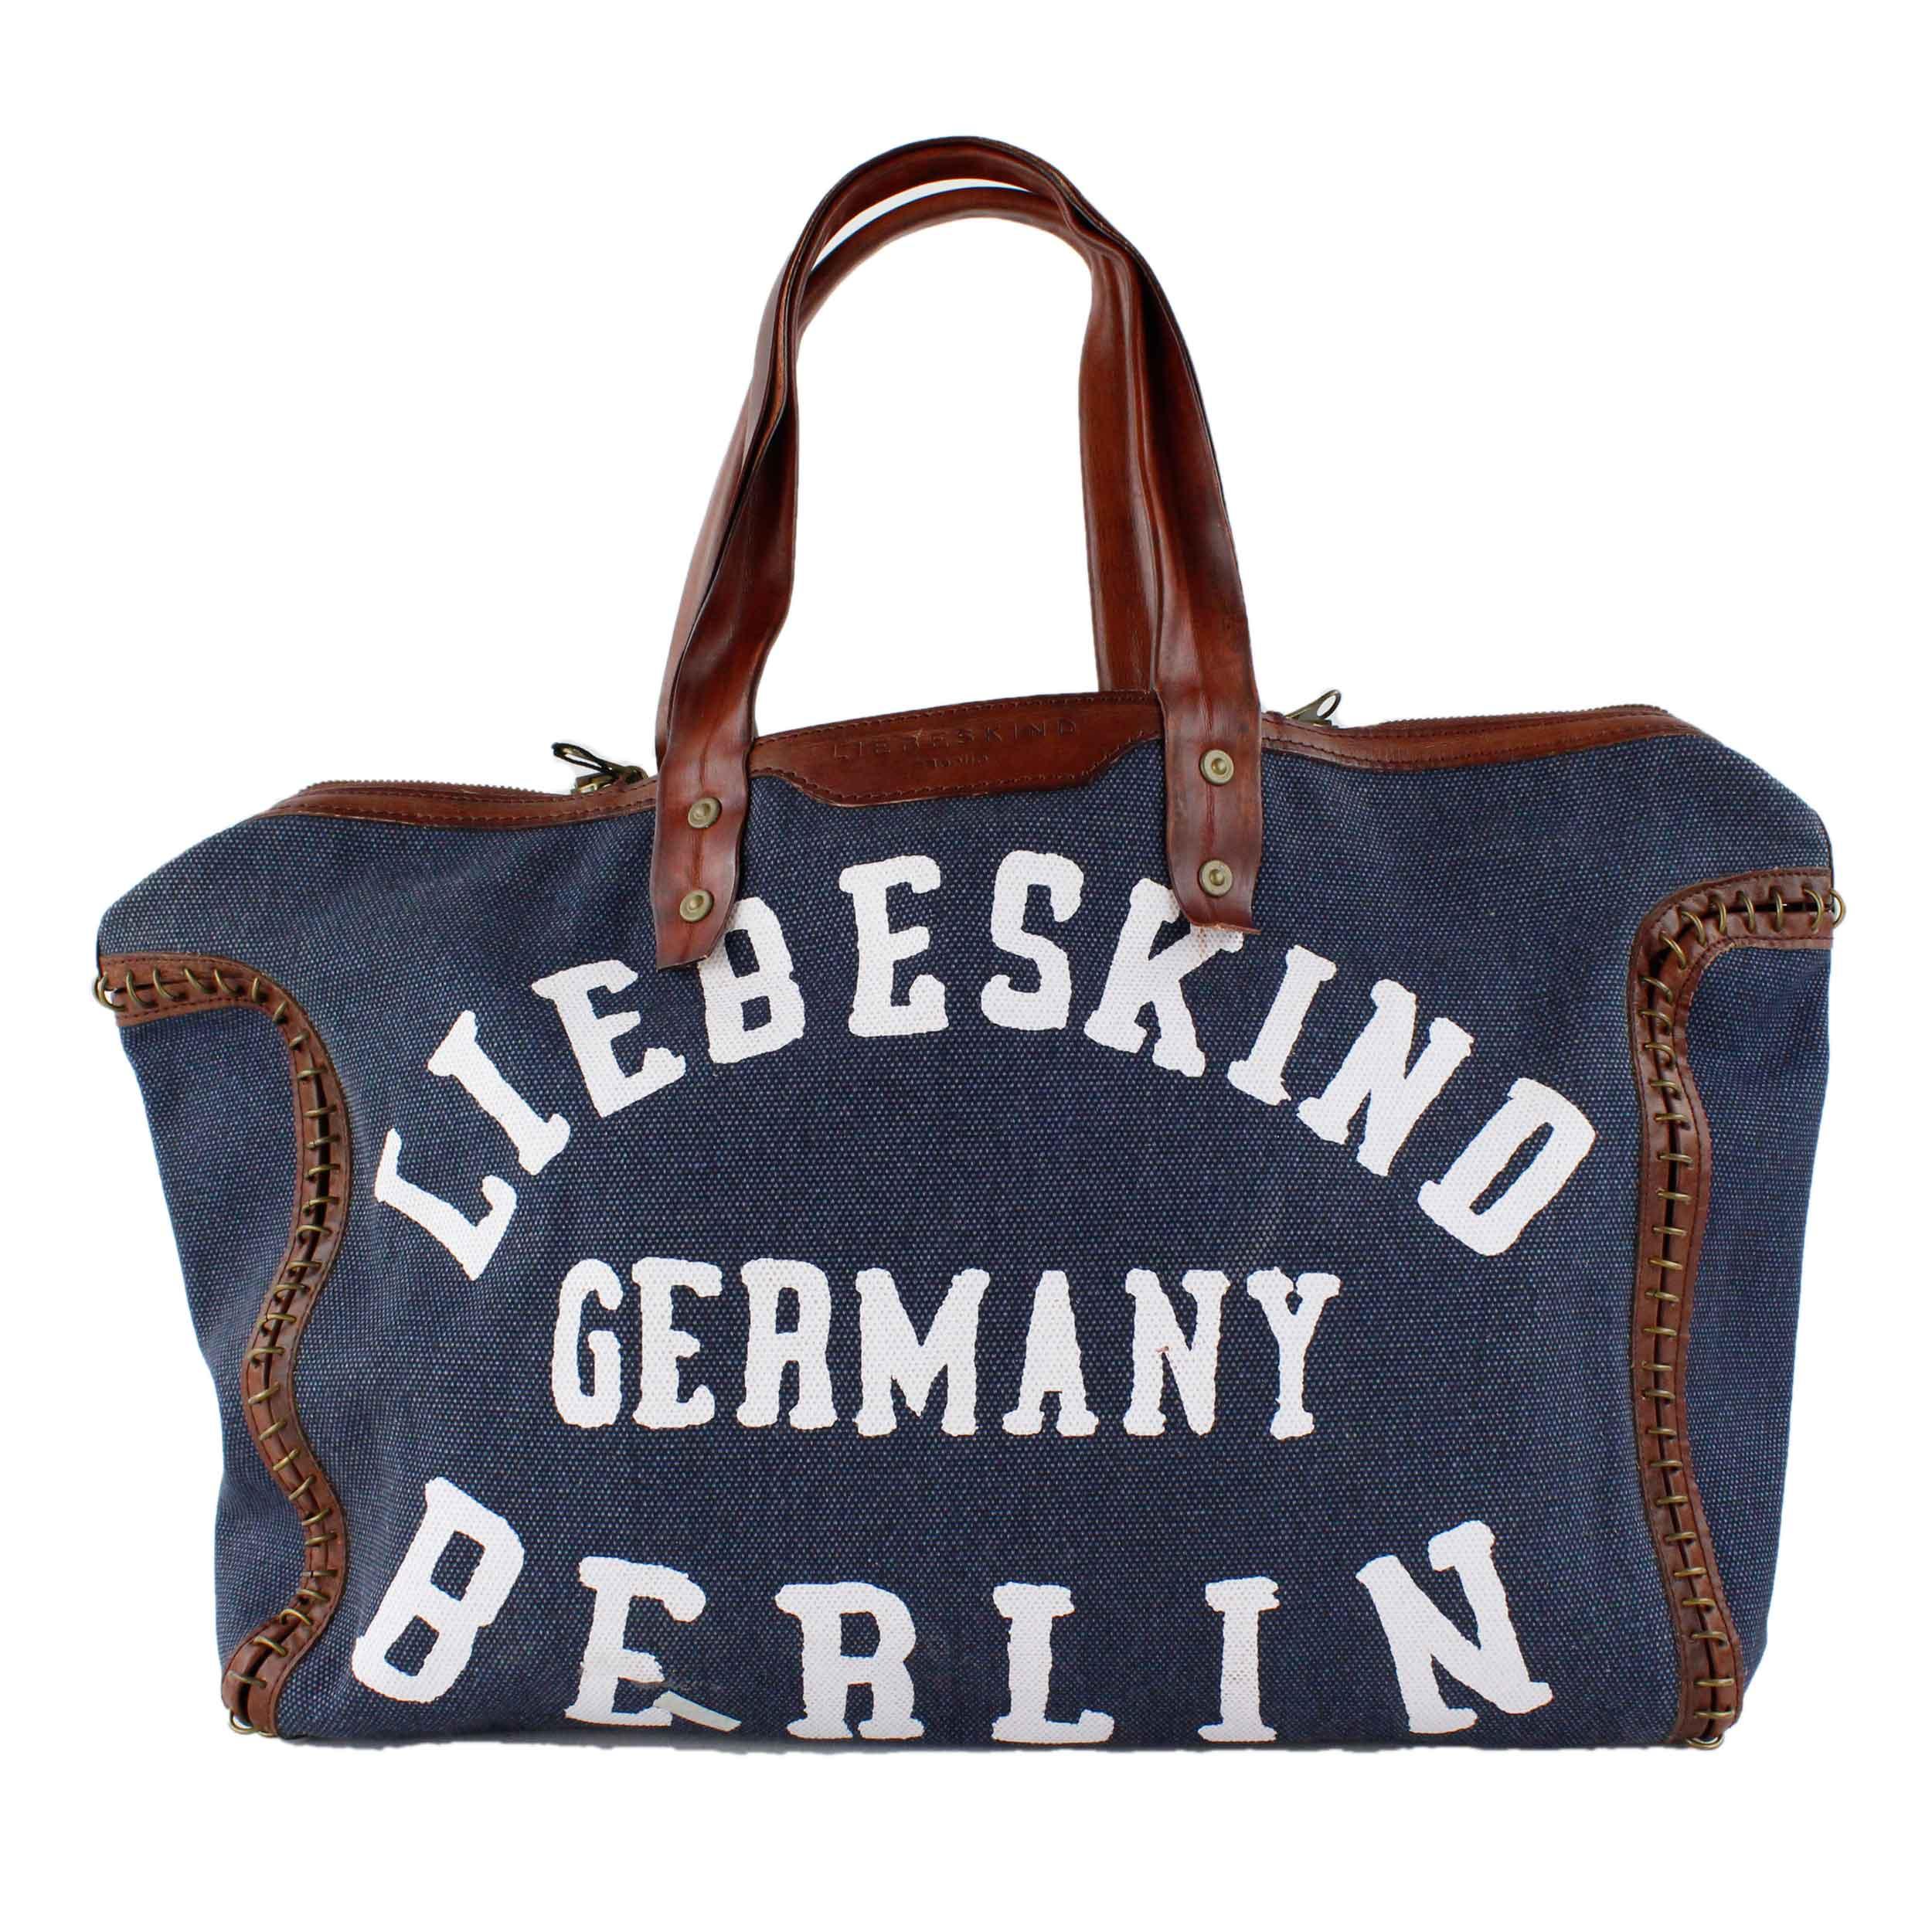 liebeskind berlin lkb tasche shopper wendetasche 2014 wendy 2 size blau sorbet ebay. Black Bedroom Furniture Sets. Home Design Ideas